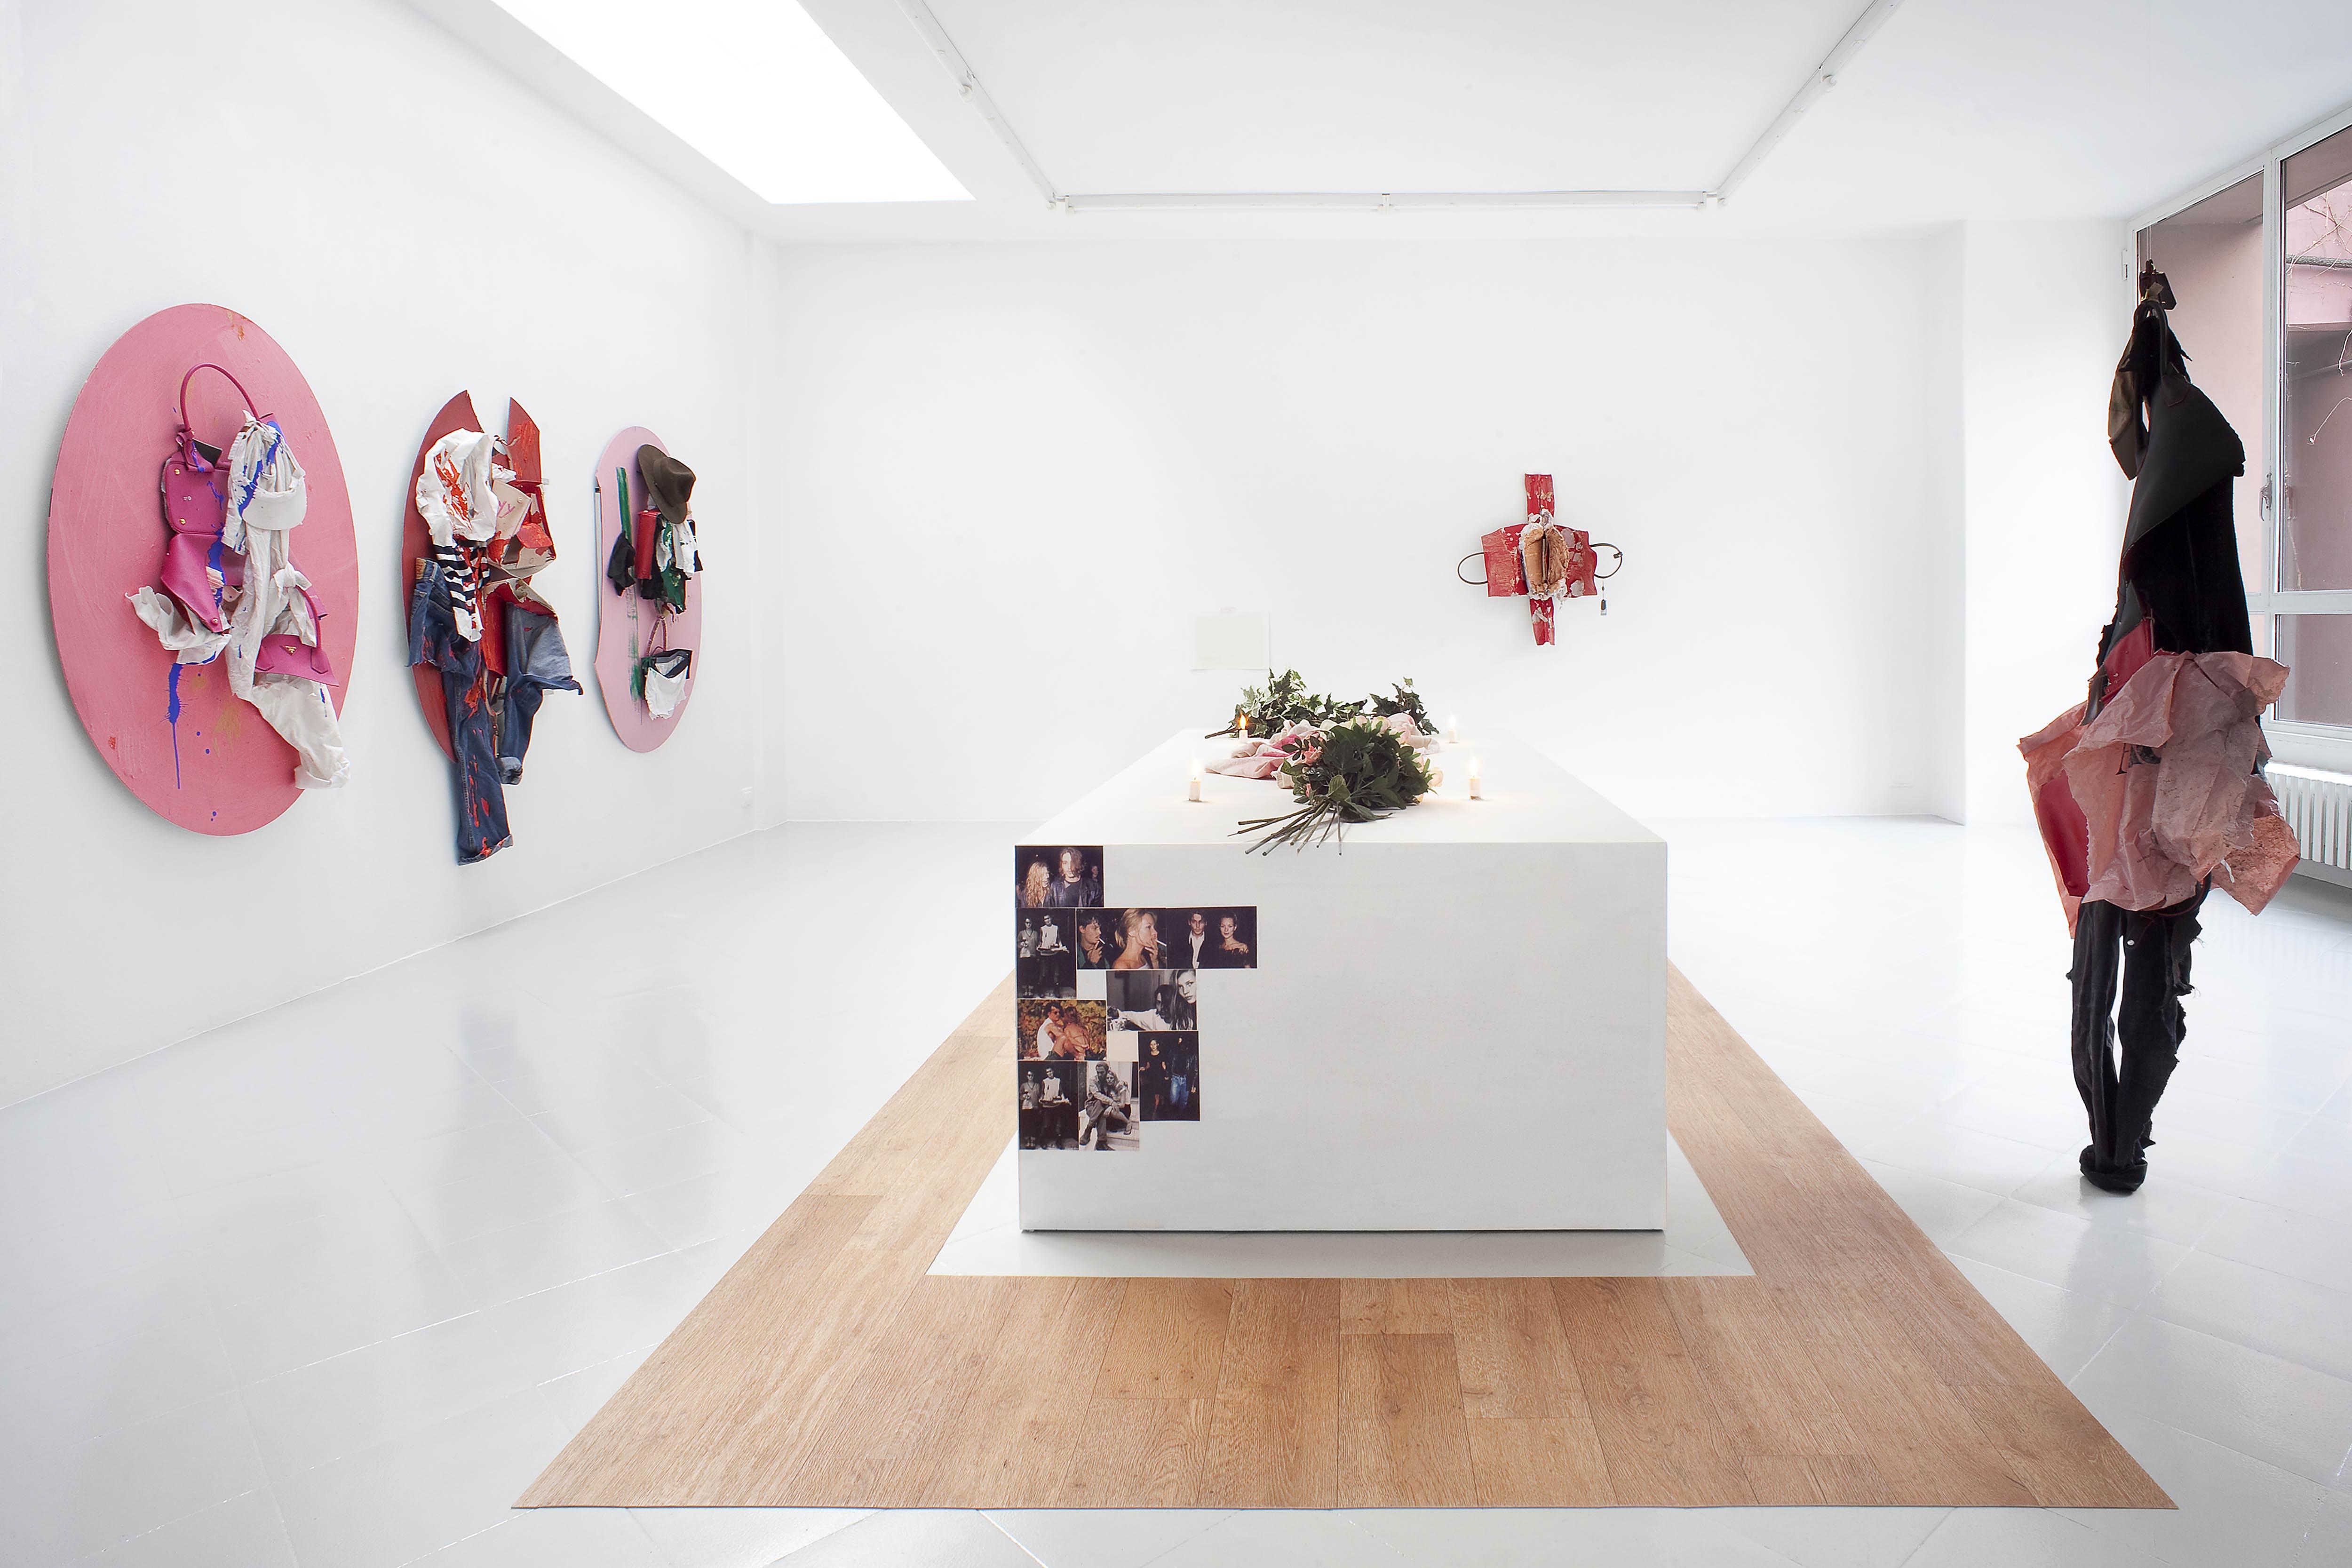 2 - Yves Scherer Installation view 2015 - Courtesy Studiolo Milan - Photo Filippo Armellin